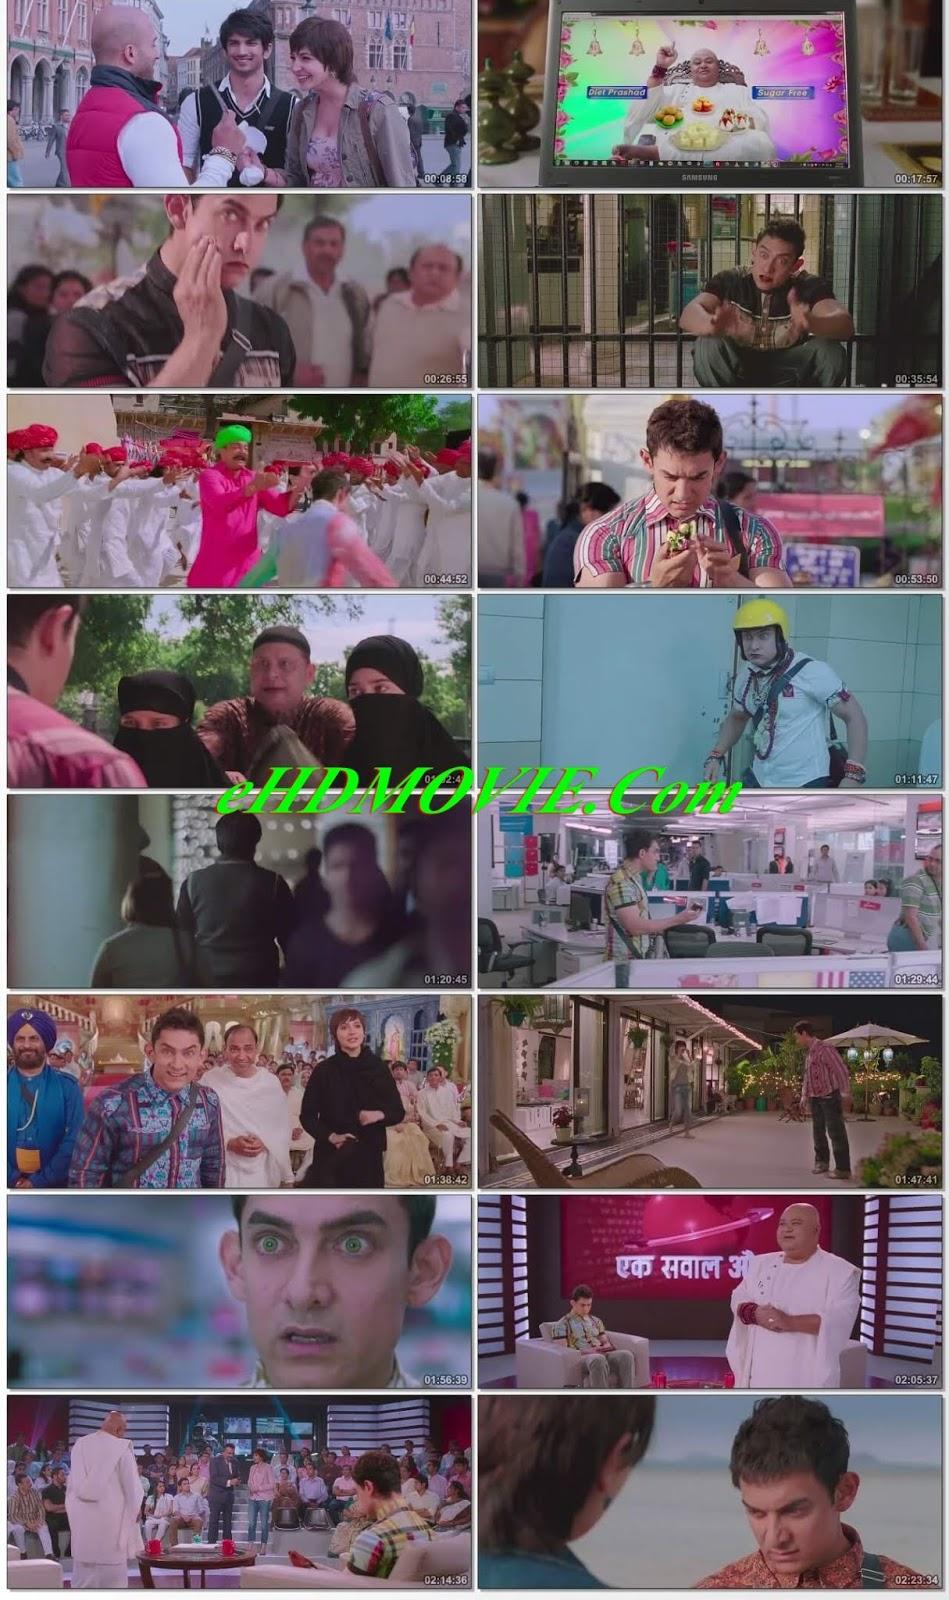 PK 2014 Hindi 720p BRRip 500MB HEVC ESubs